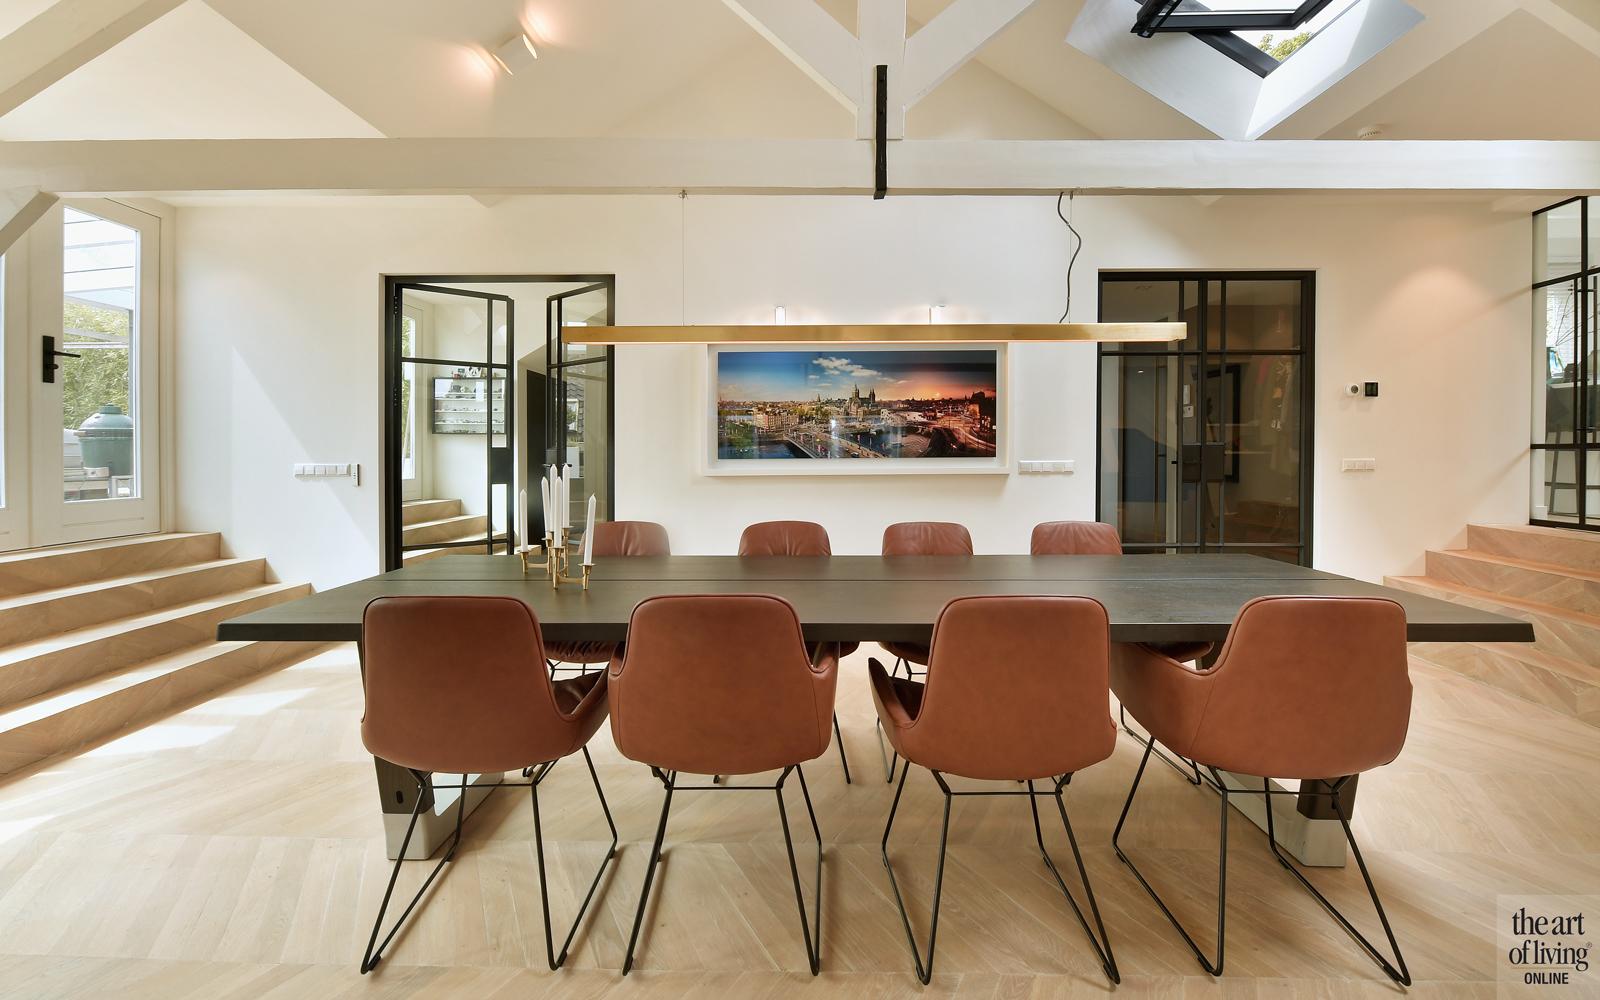 Penthouse, By Thimble, Woonkamer, eetkamer, eettafel, Open keuken, design meubels, Houten vloer